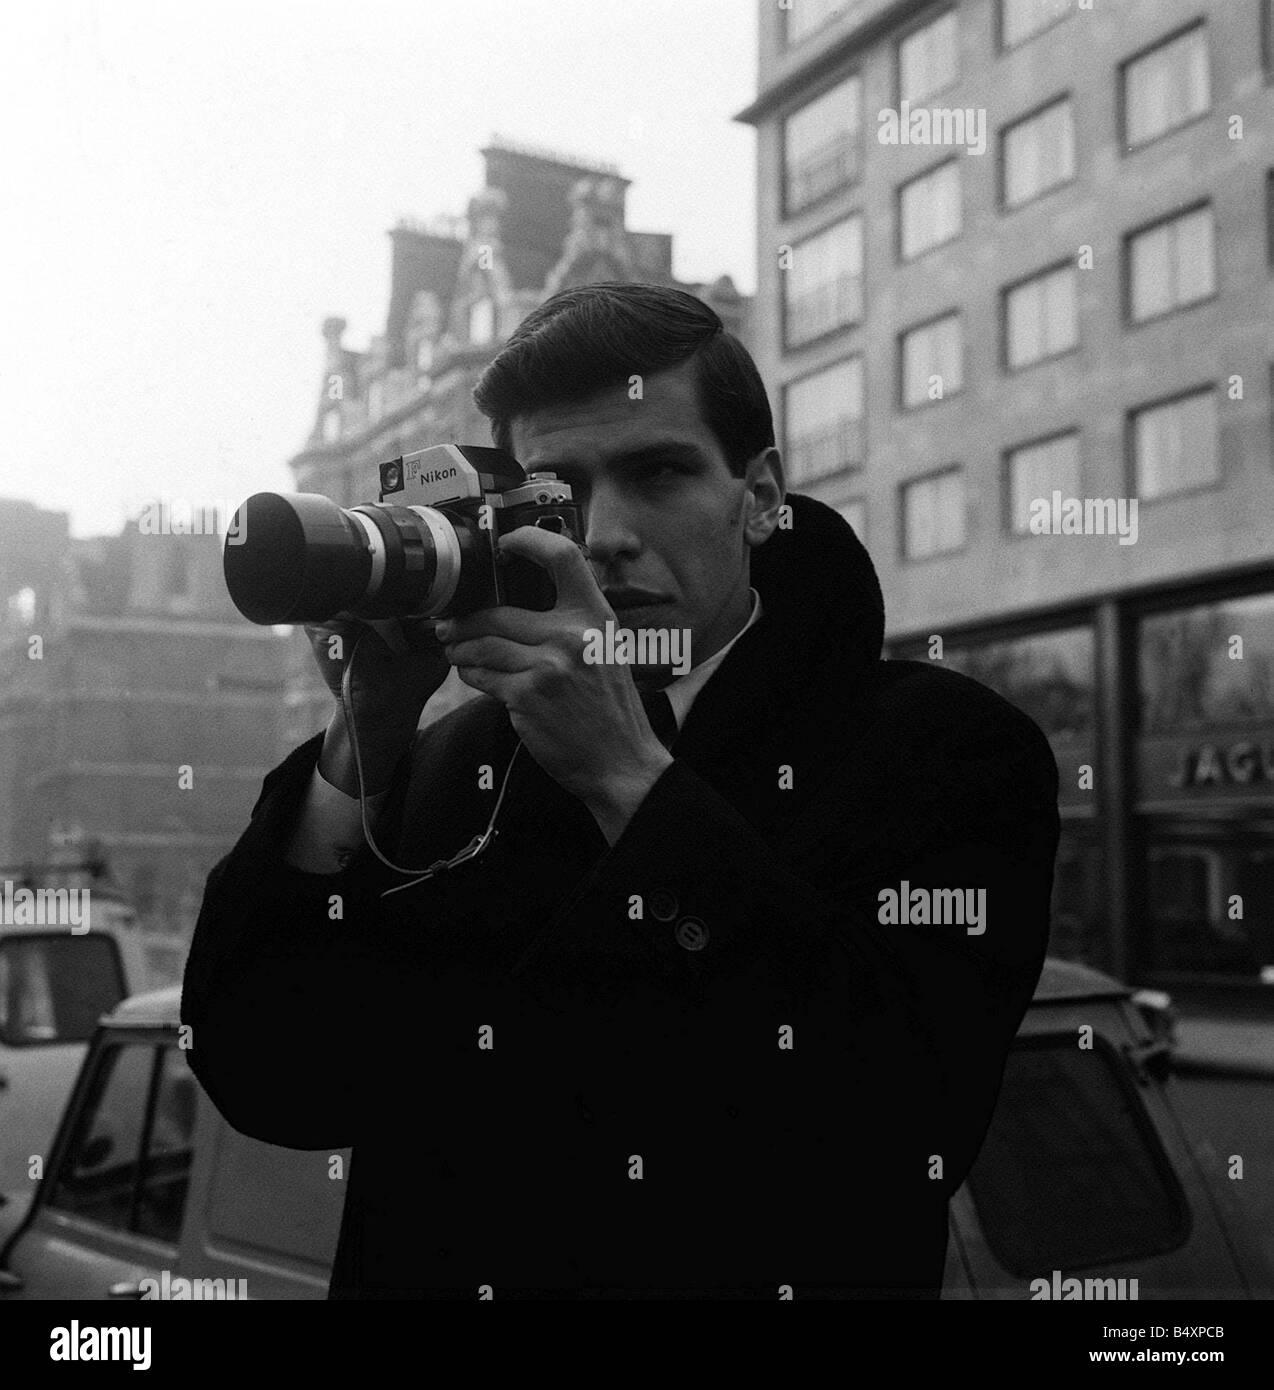 Frank Sinatra Jnr in London January 1964 taking photograph with a Nikon F SLR Camera - Stock Image